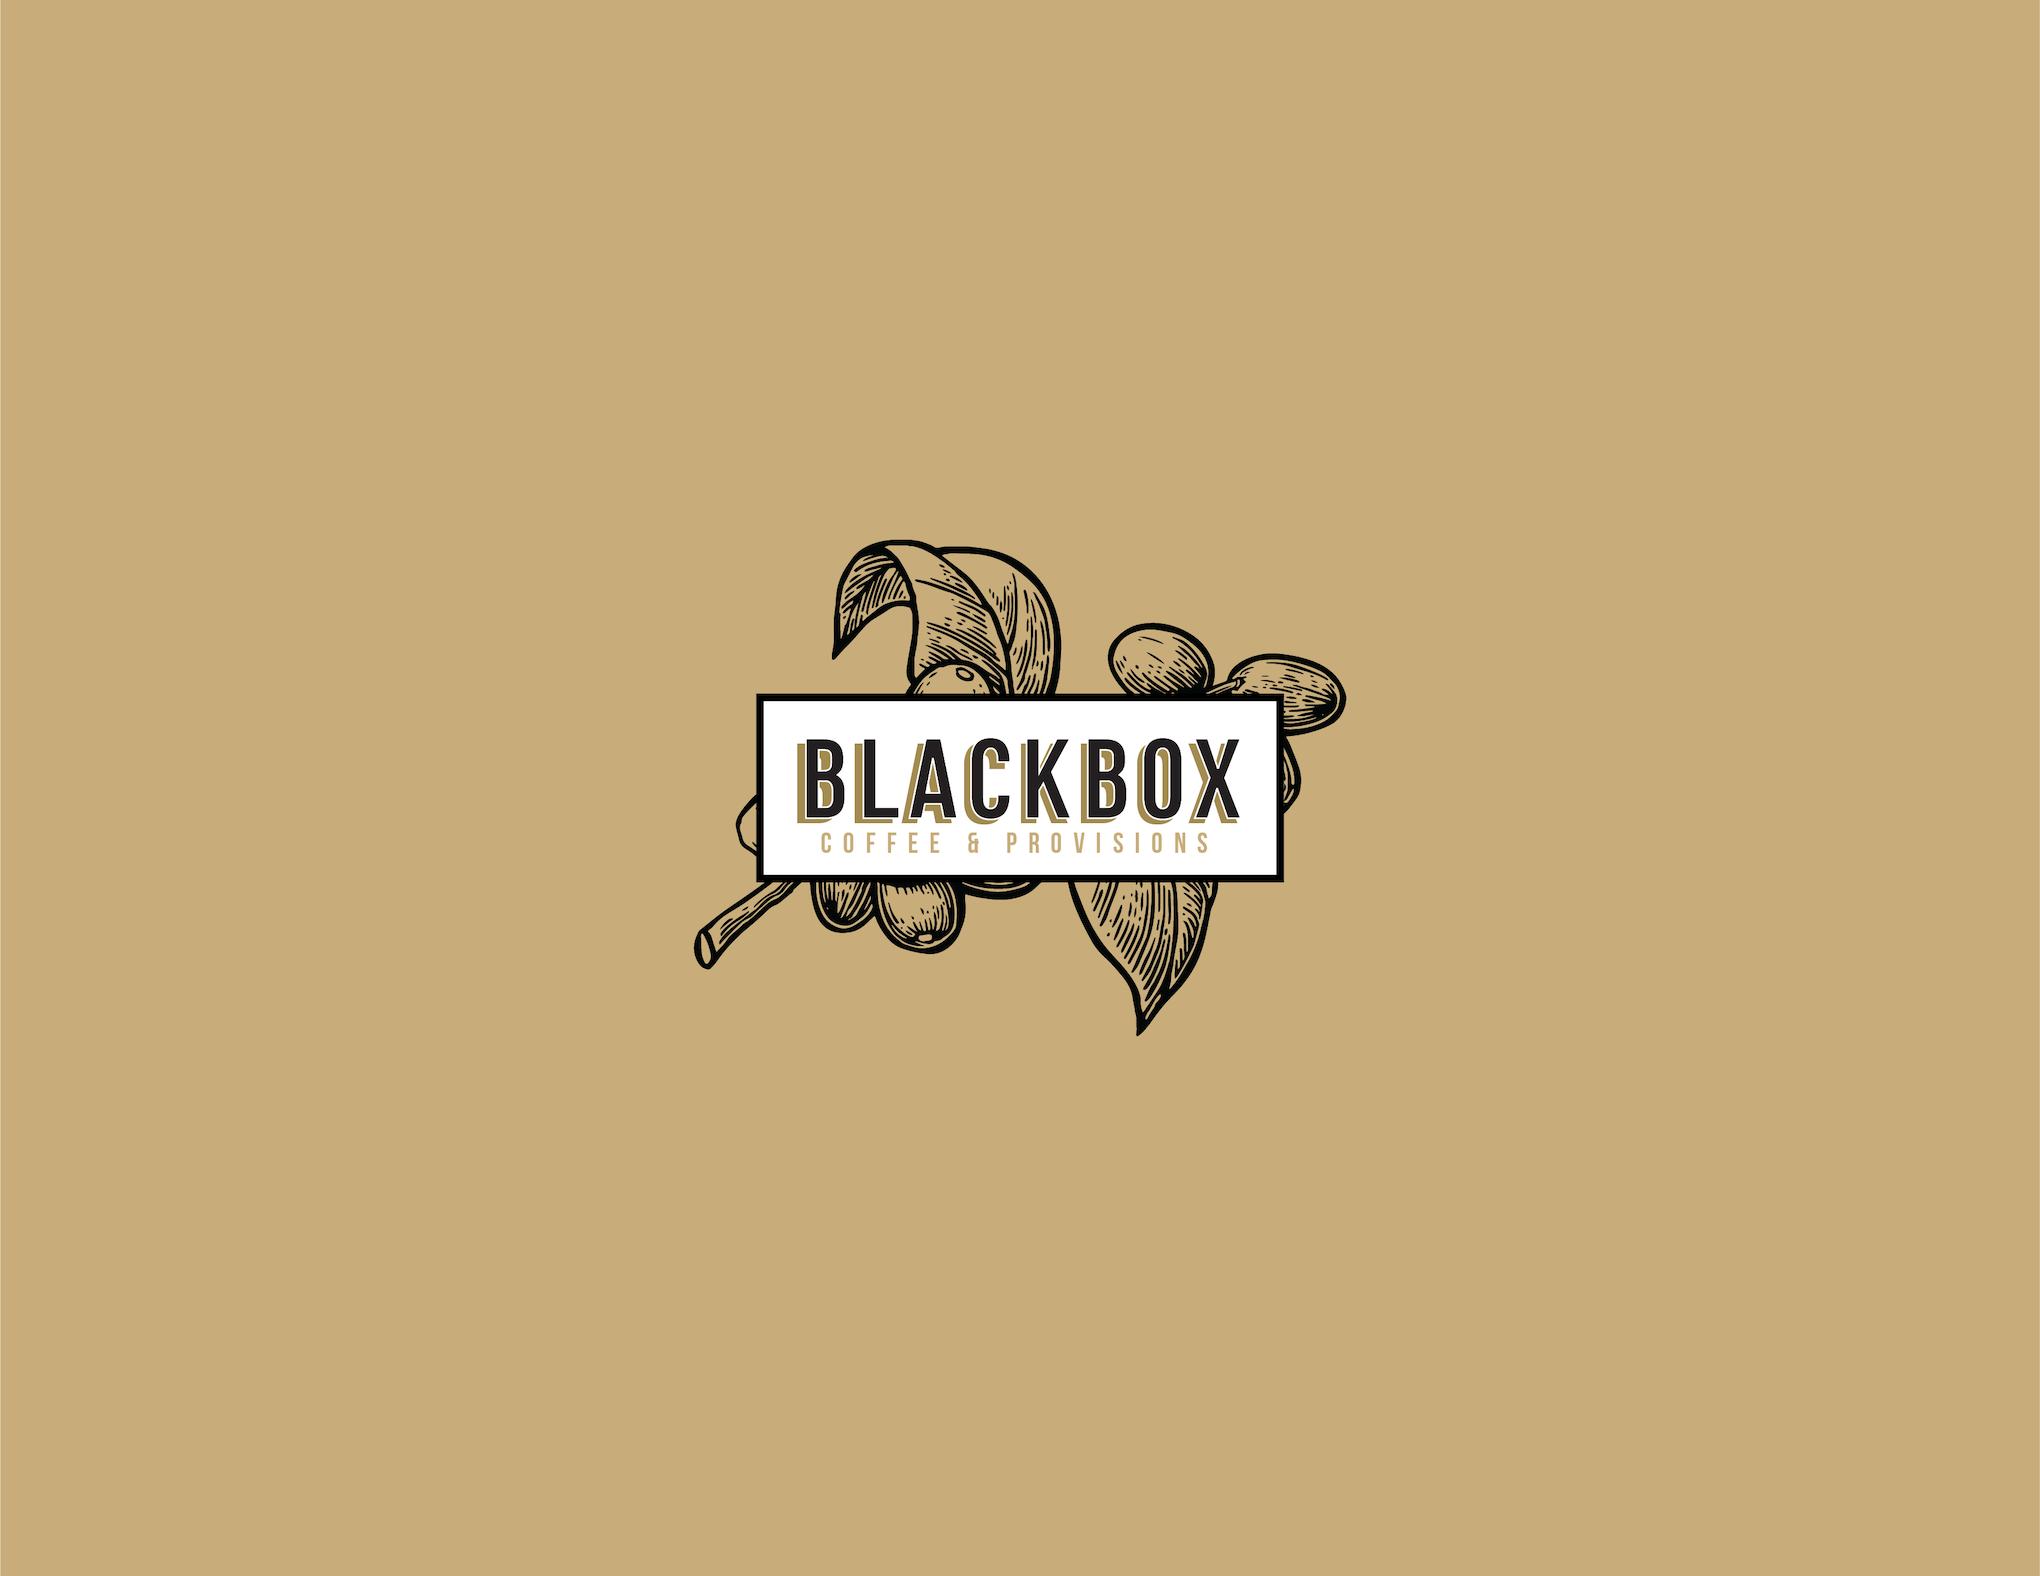 Blackbox cafe